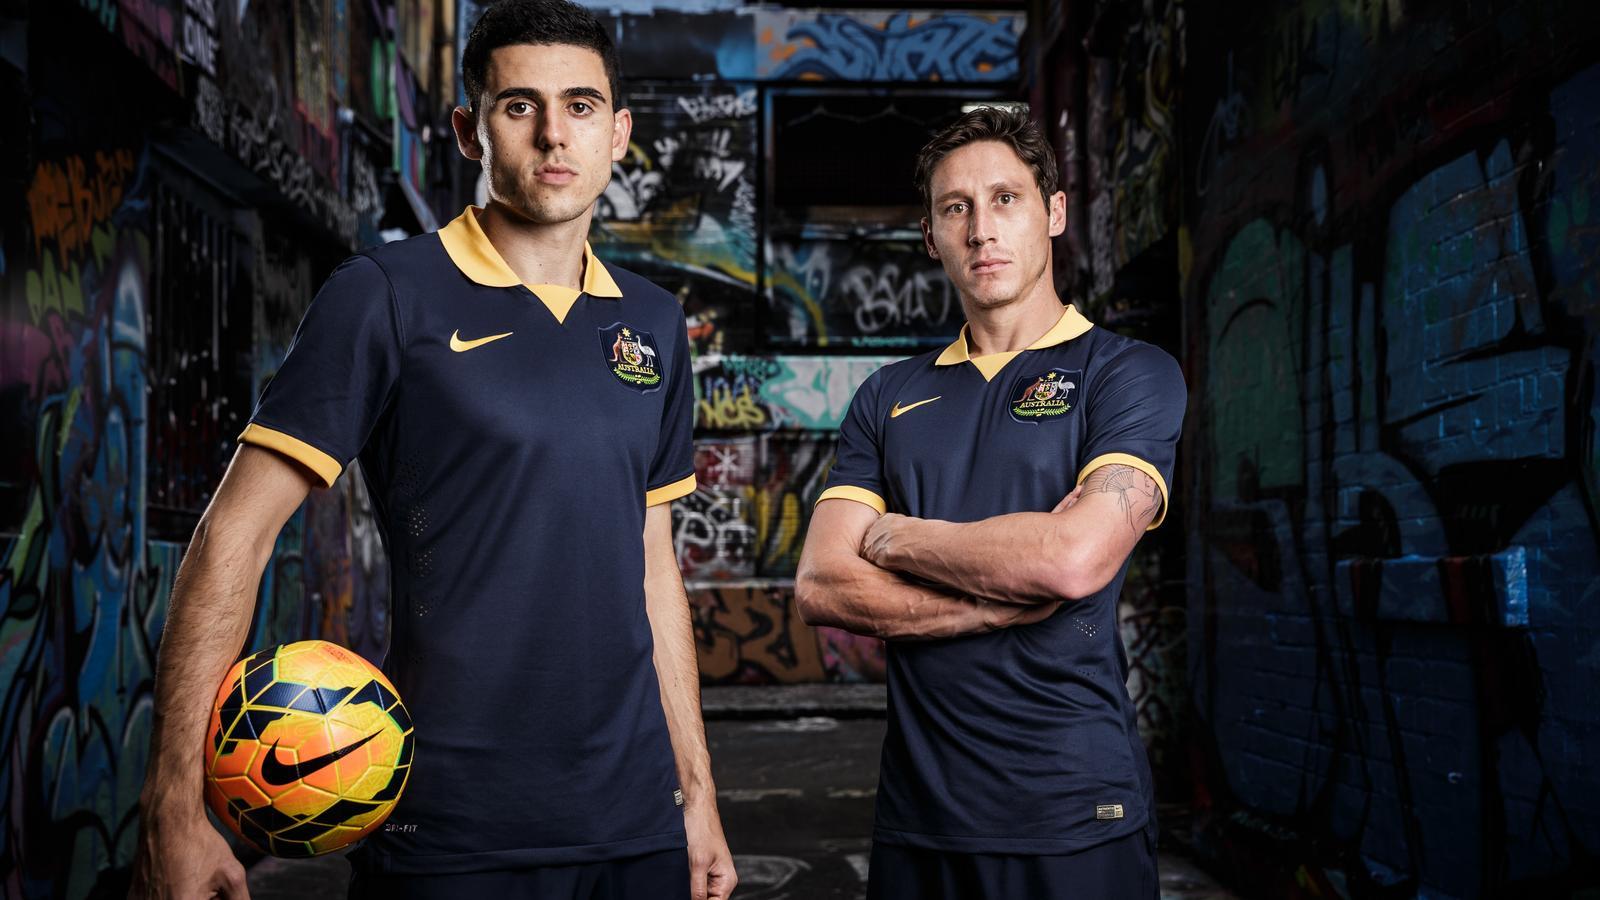 Australia Debuts New Nike Away Kit for 2014